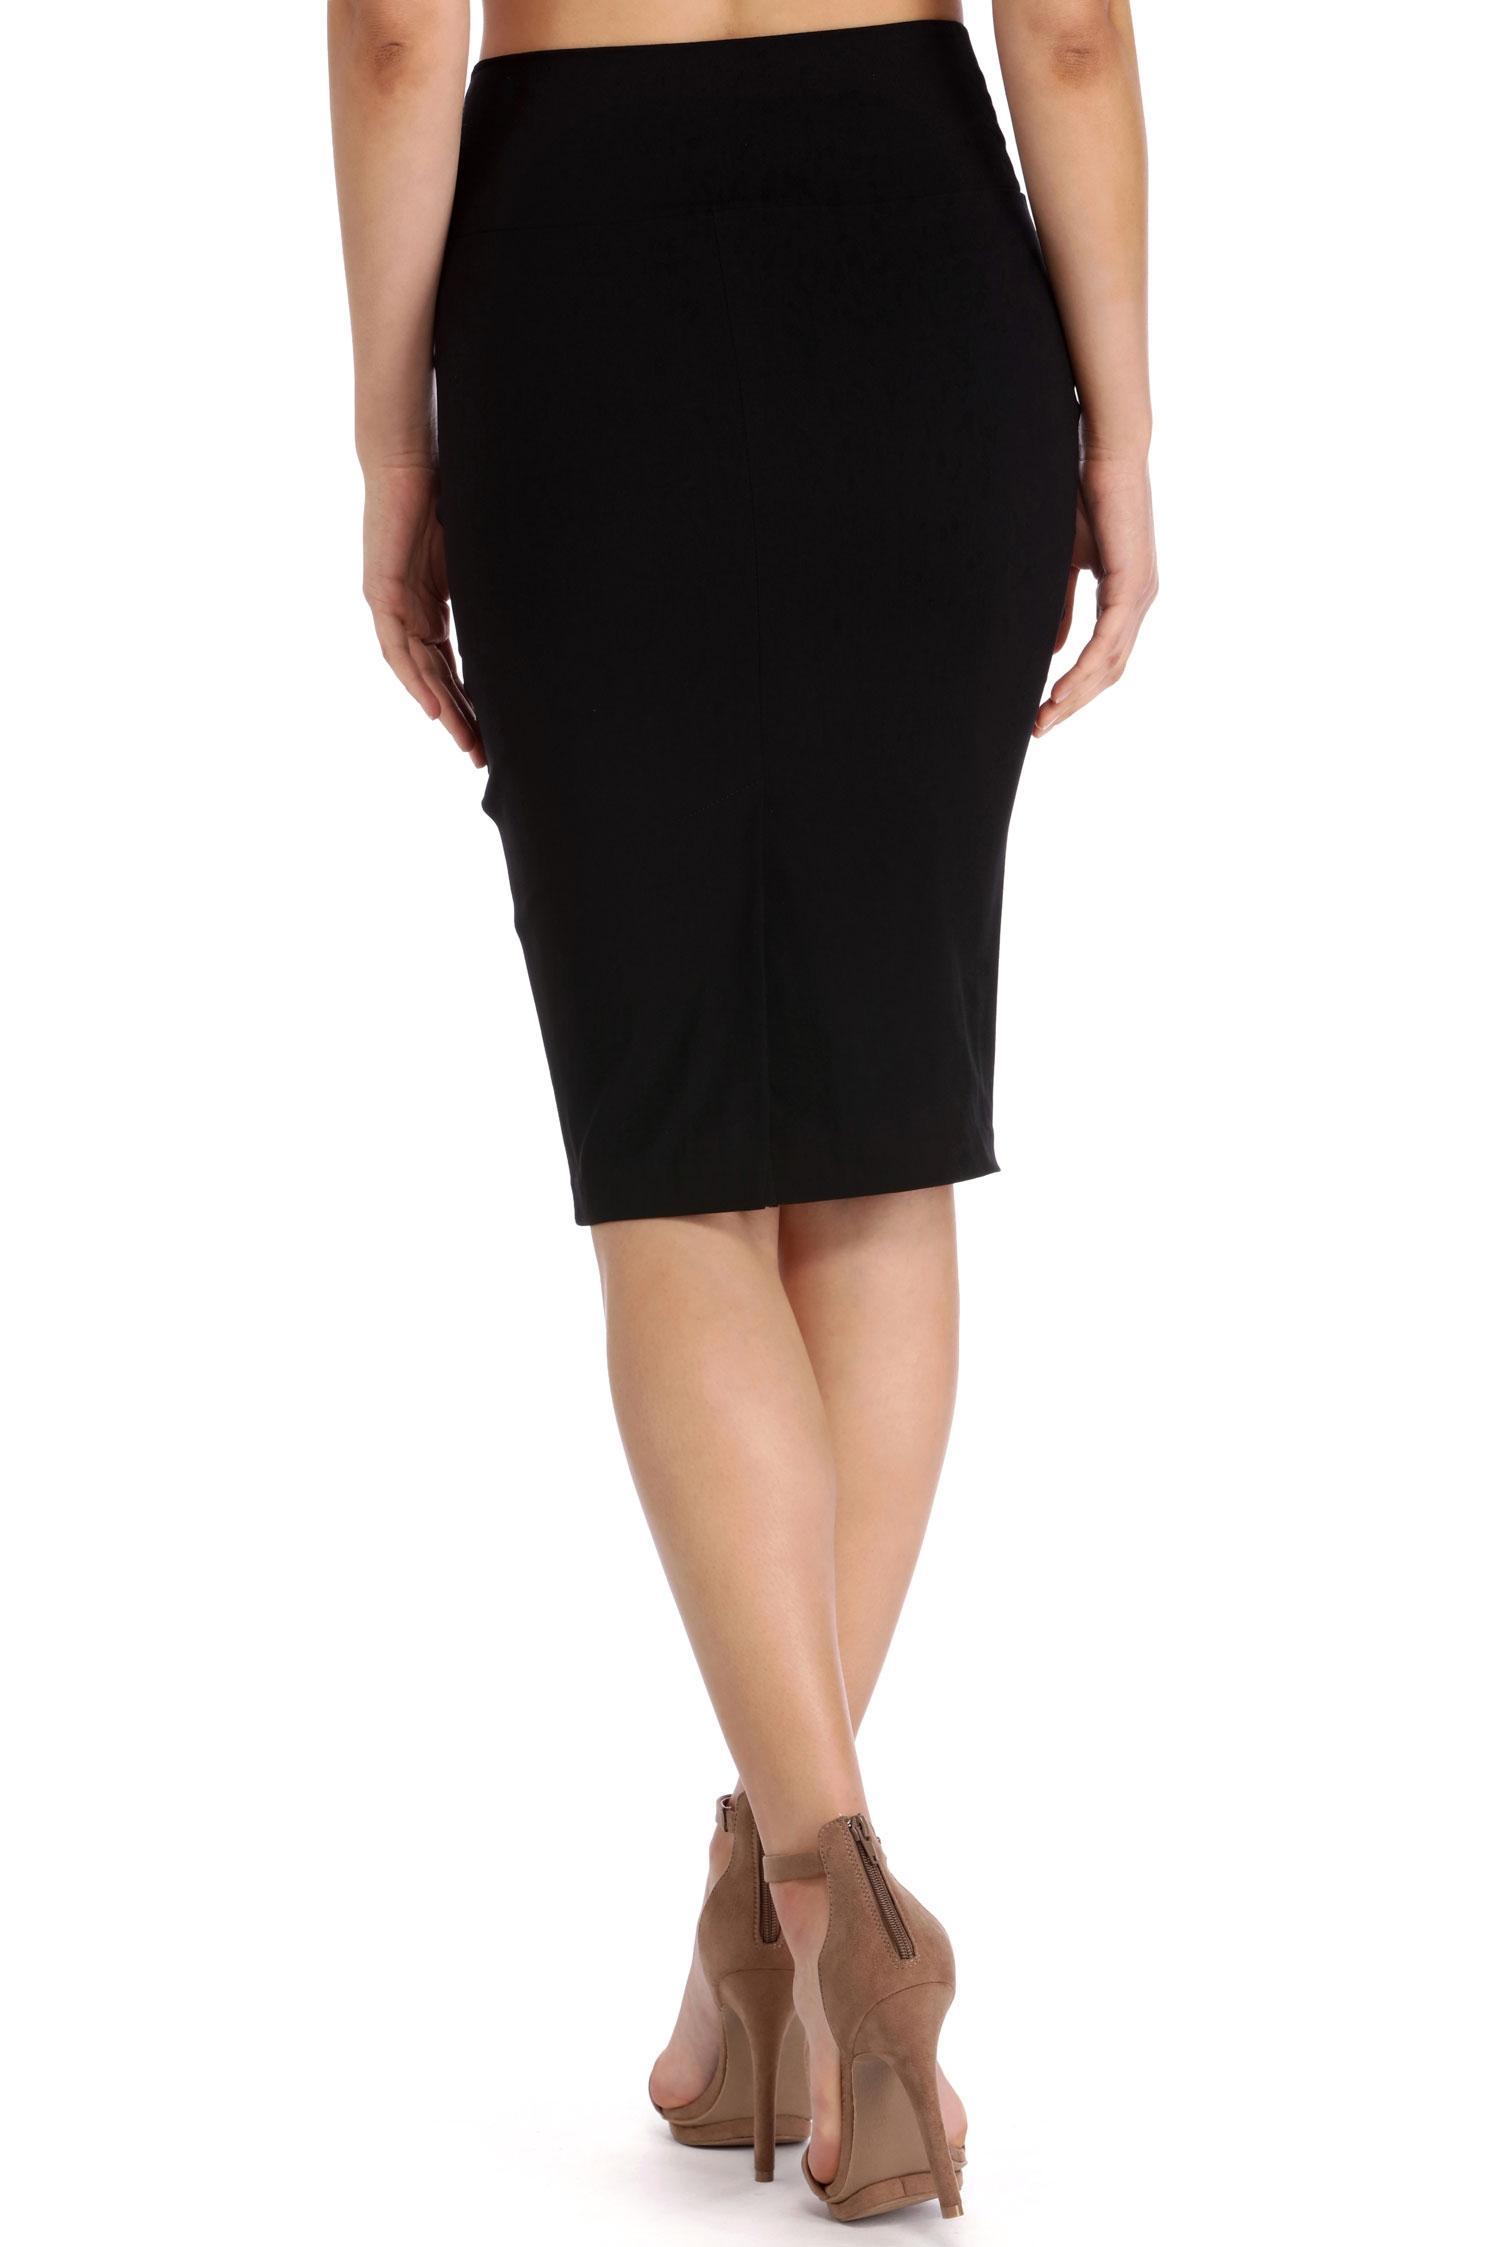 black high waisted skirt black high waisted pencil skirt. style #: 064010670. previous. default  view; 2; back DYQELDP